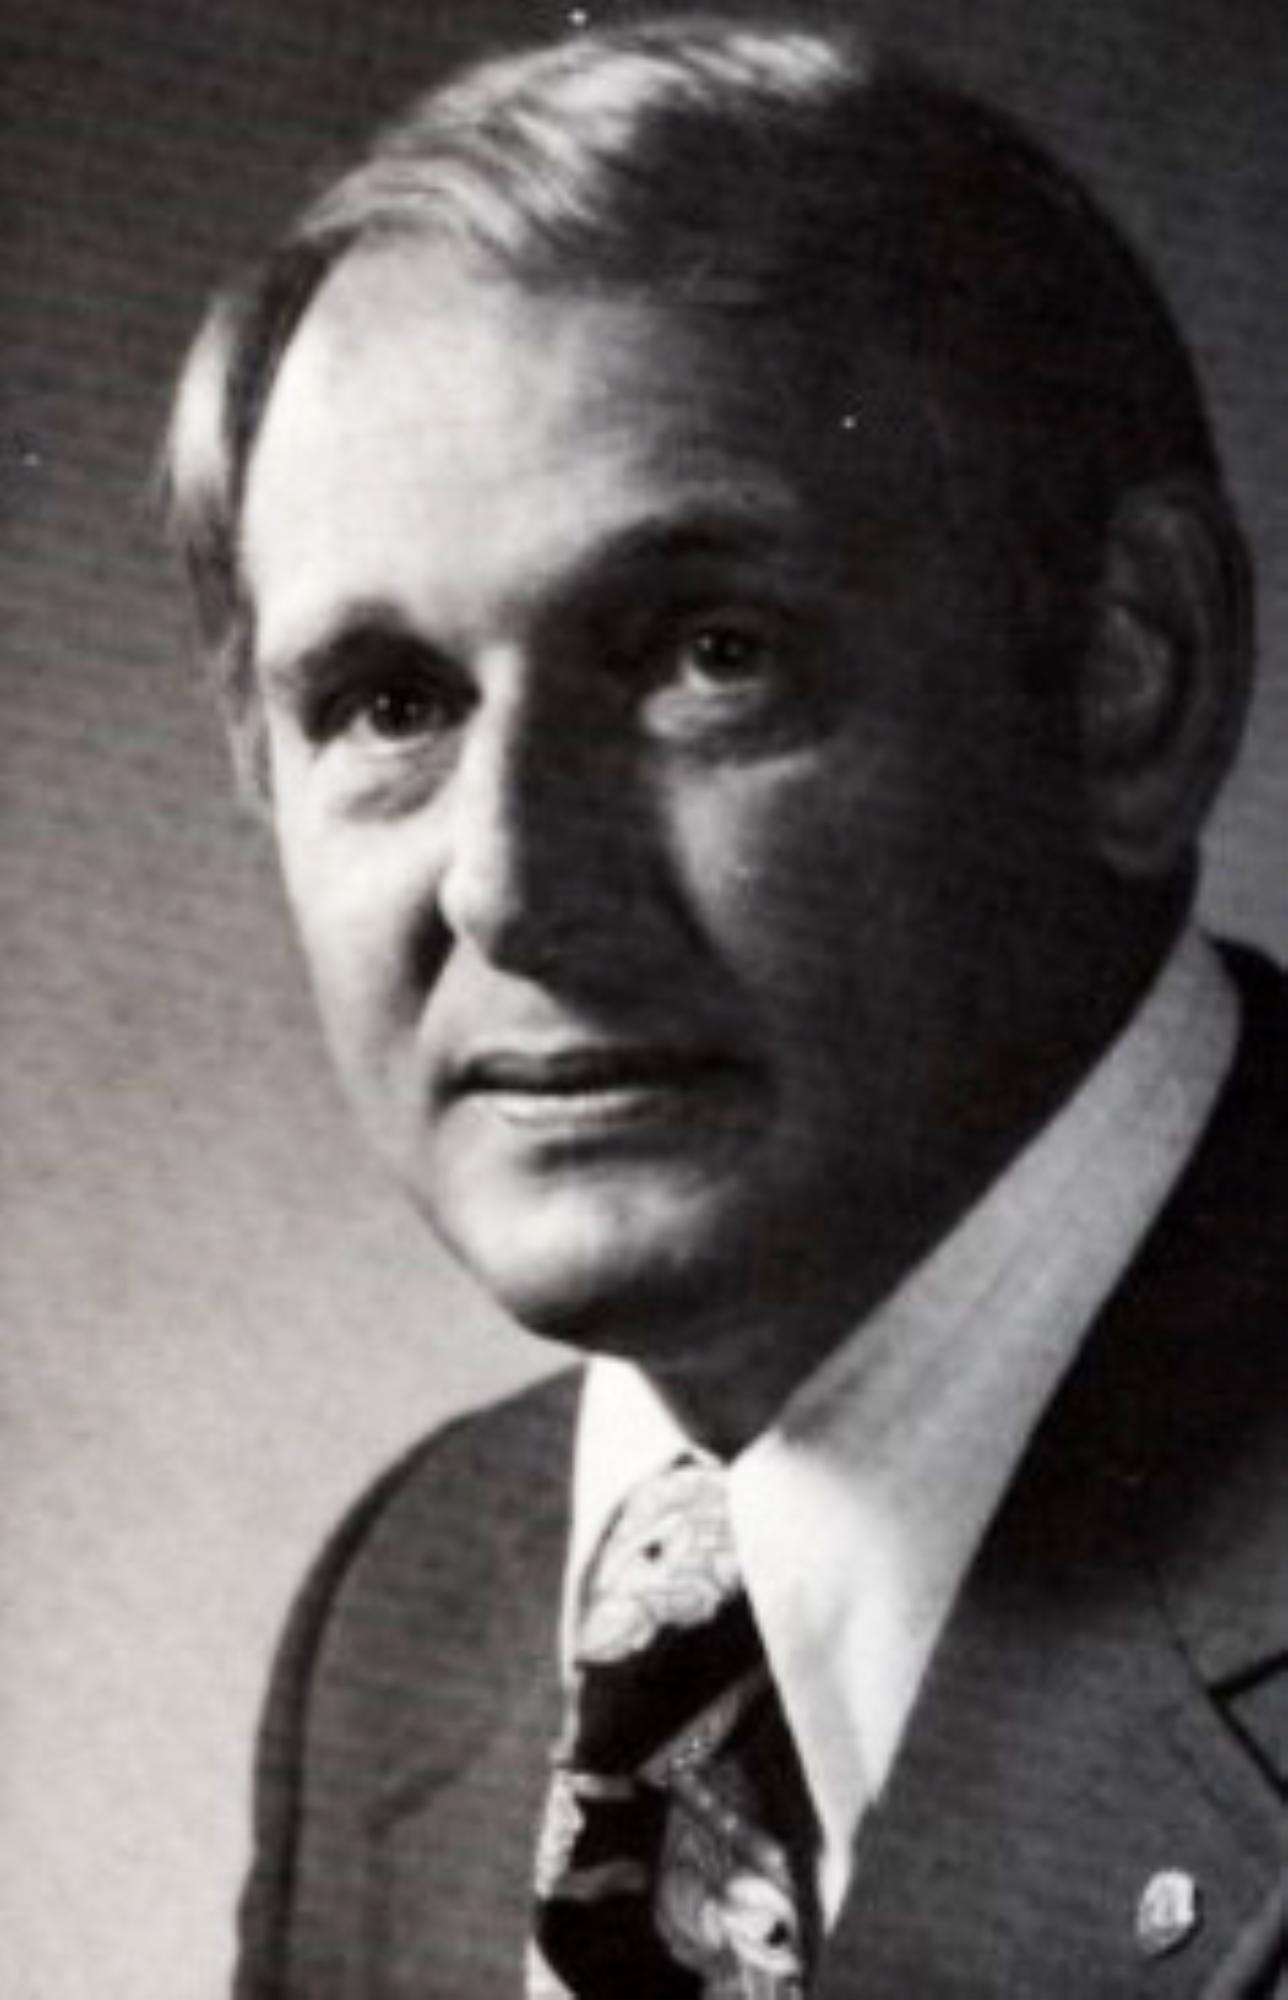 M. Rudy Groomes